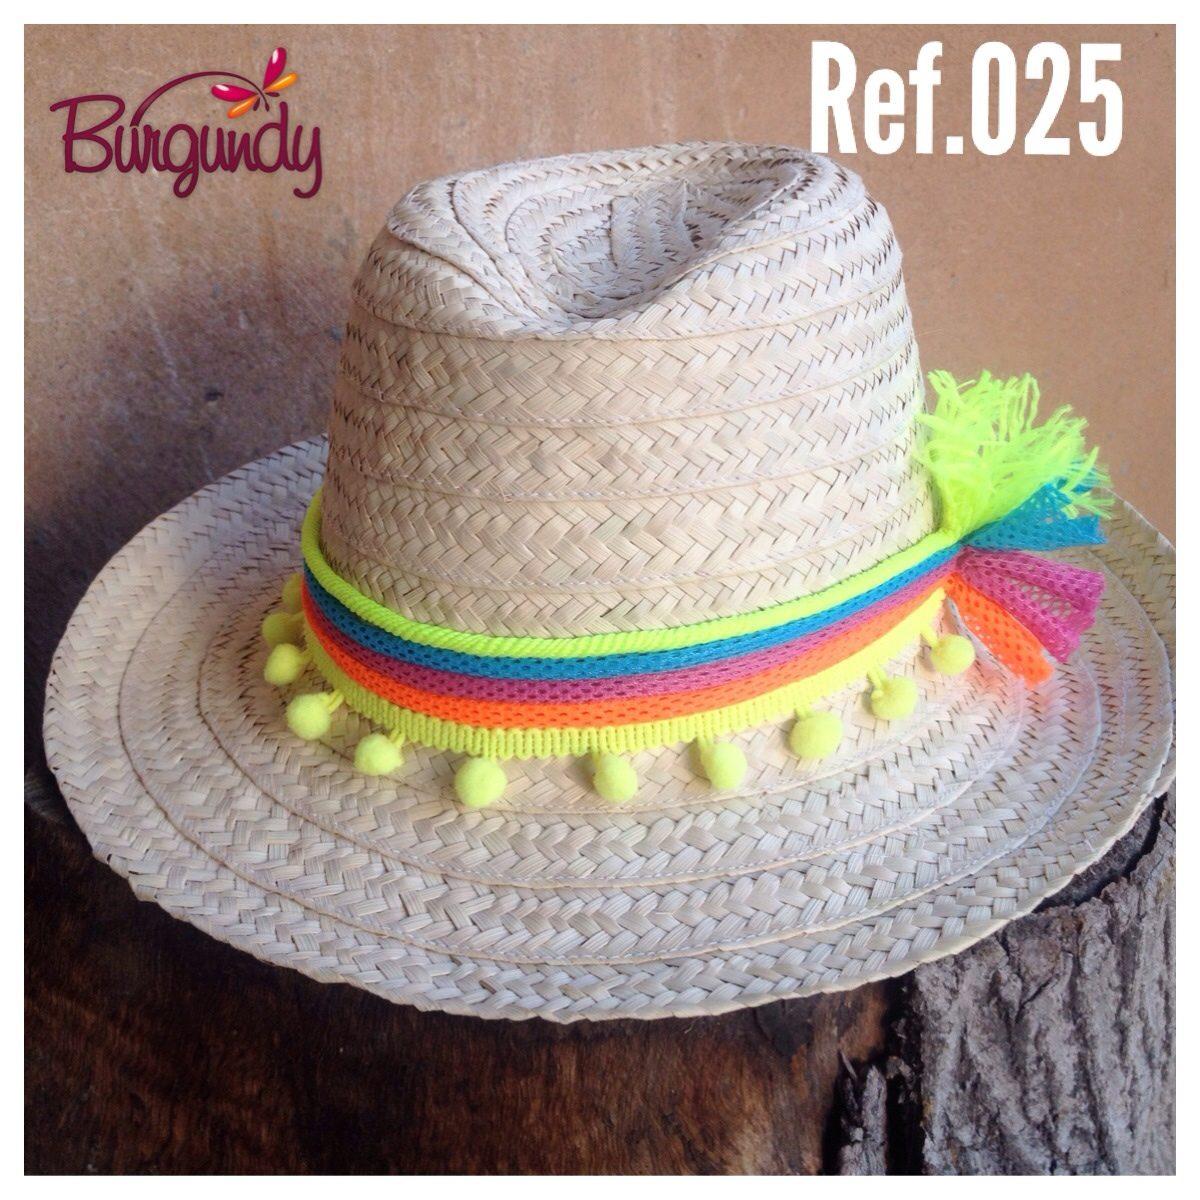 12f88a9e5fe4d Sombreros chics playeros tejidos a mano de dama trendy moda jpg 1200x1200  Trendy sombreros de moda